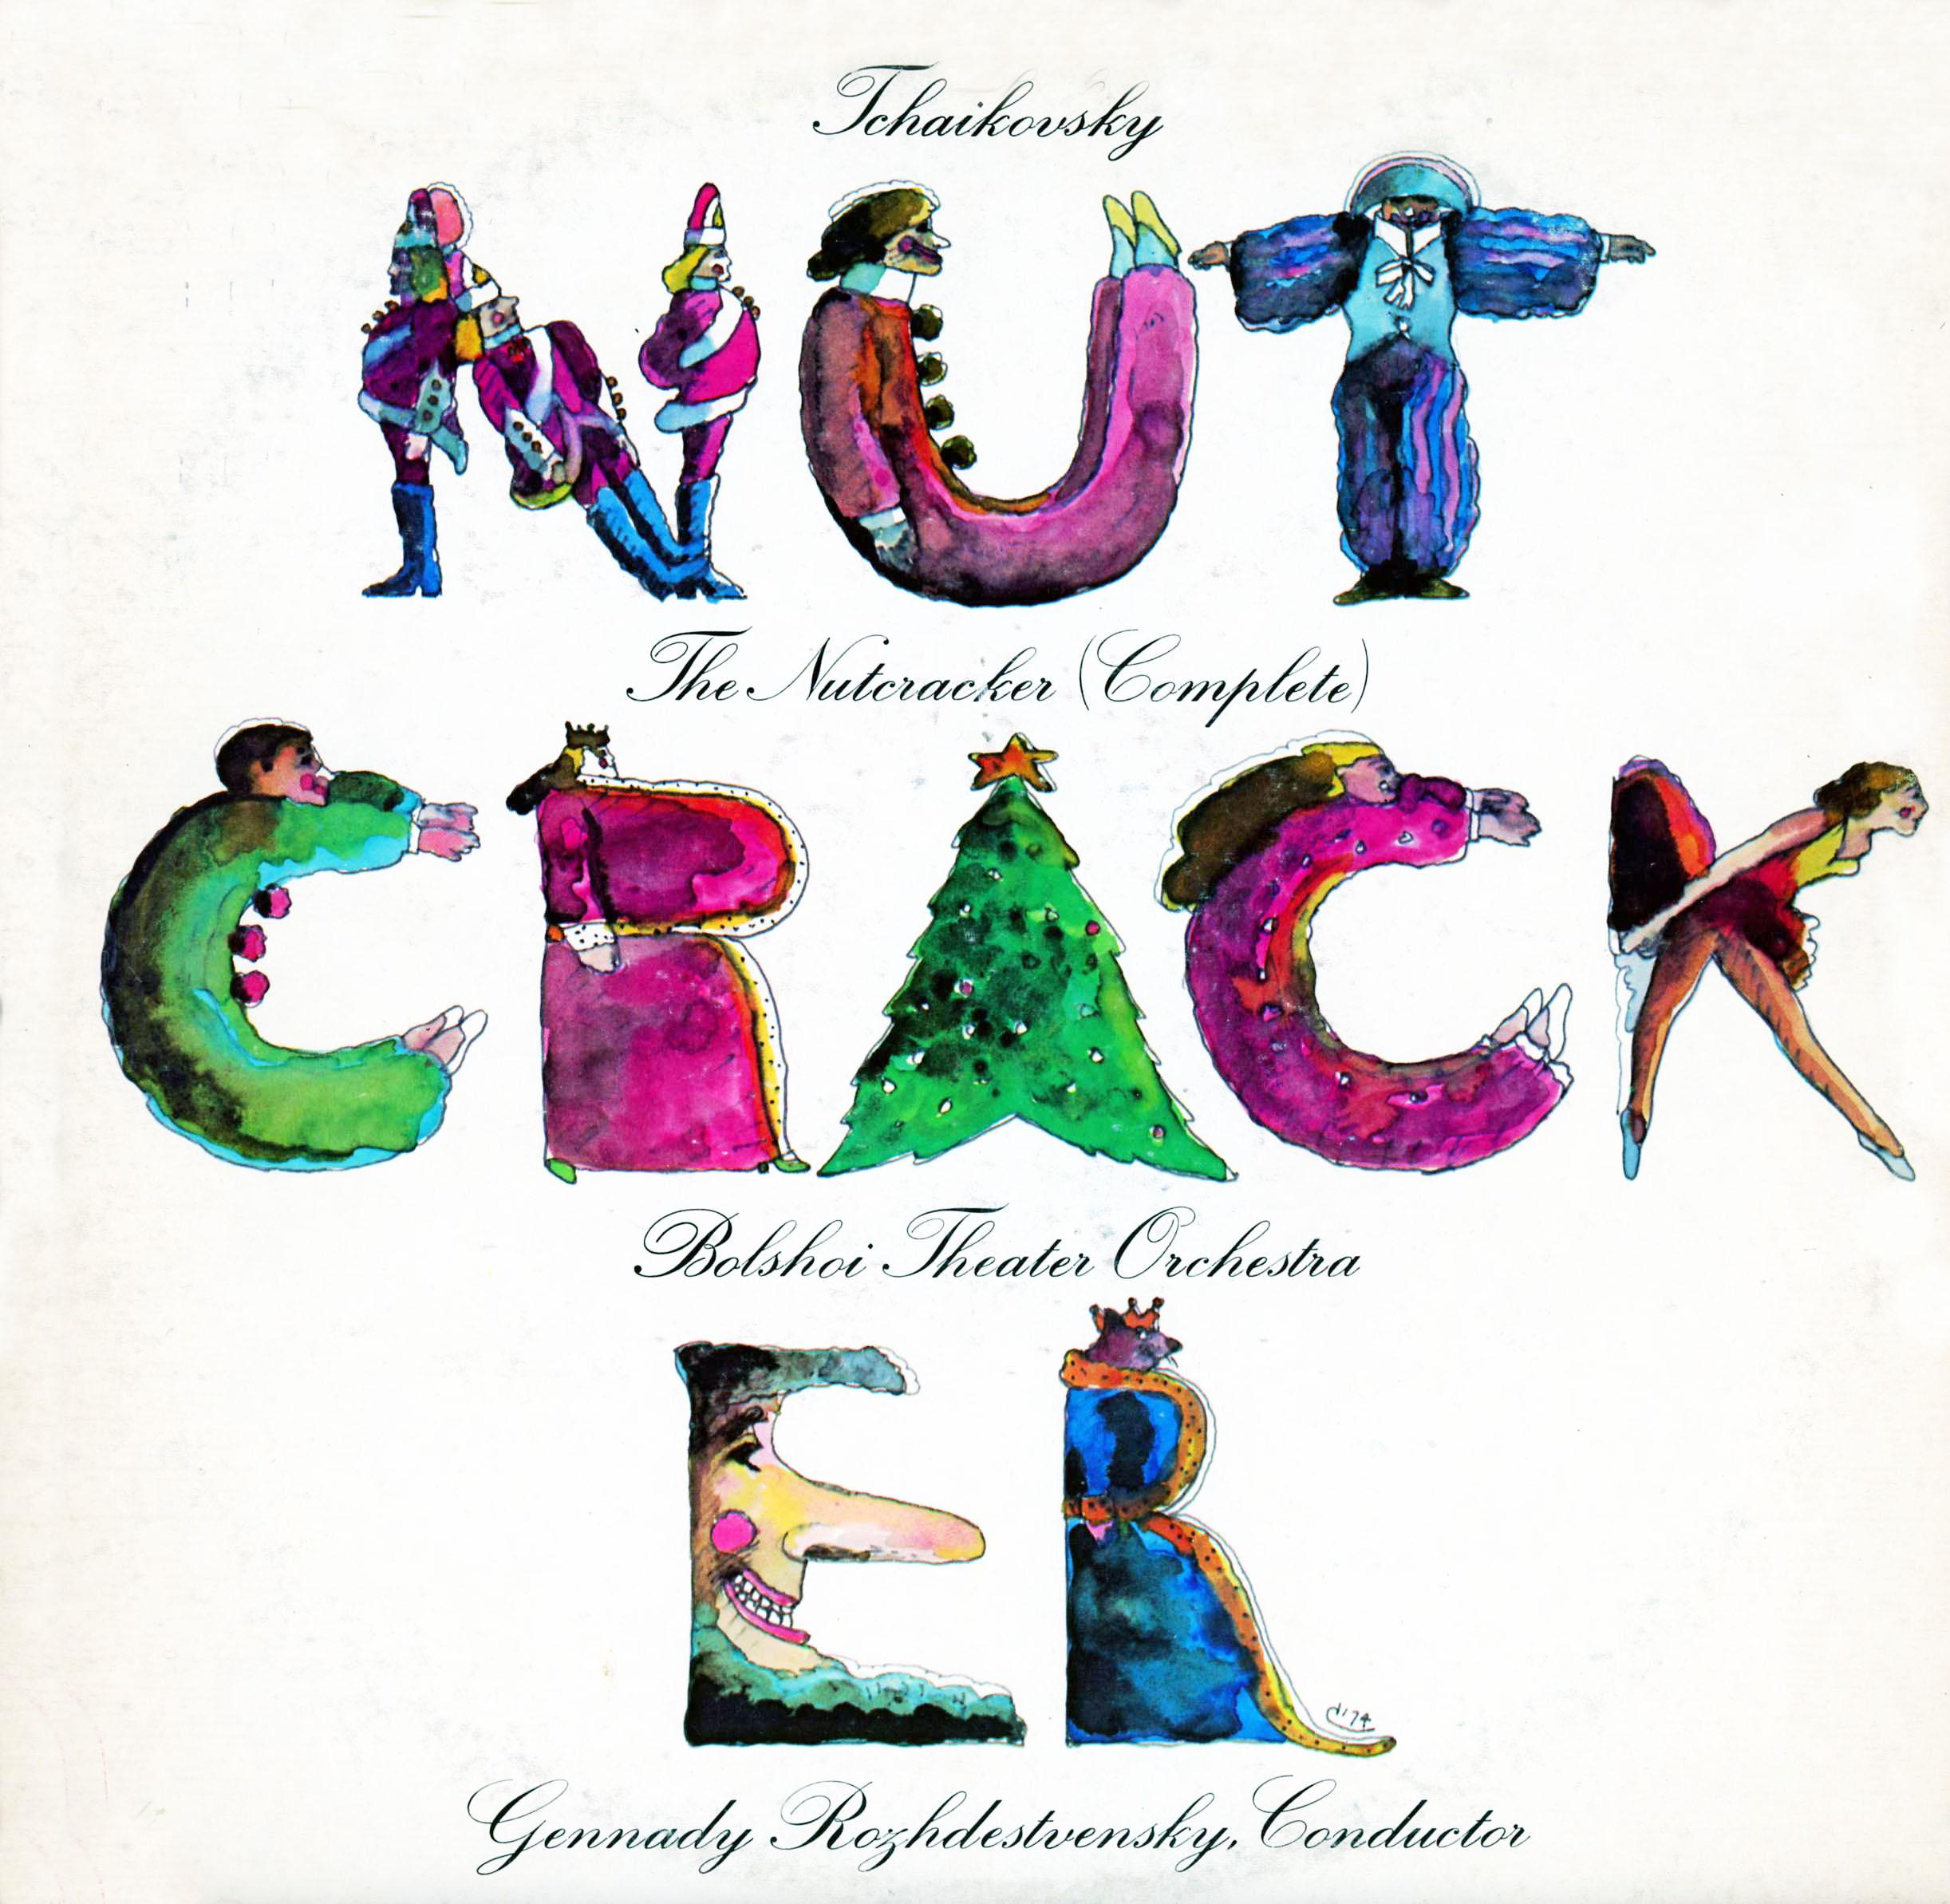 The Nutcracker By Bolshoi Theatre